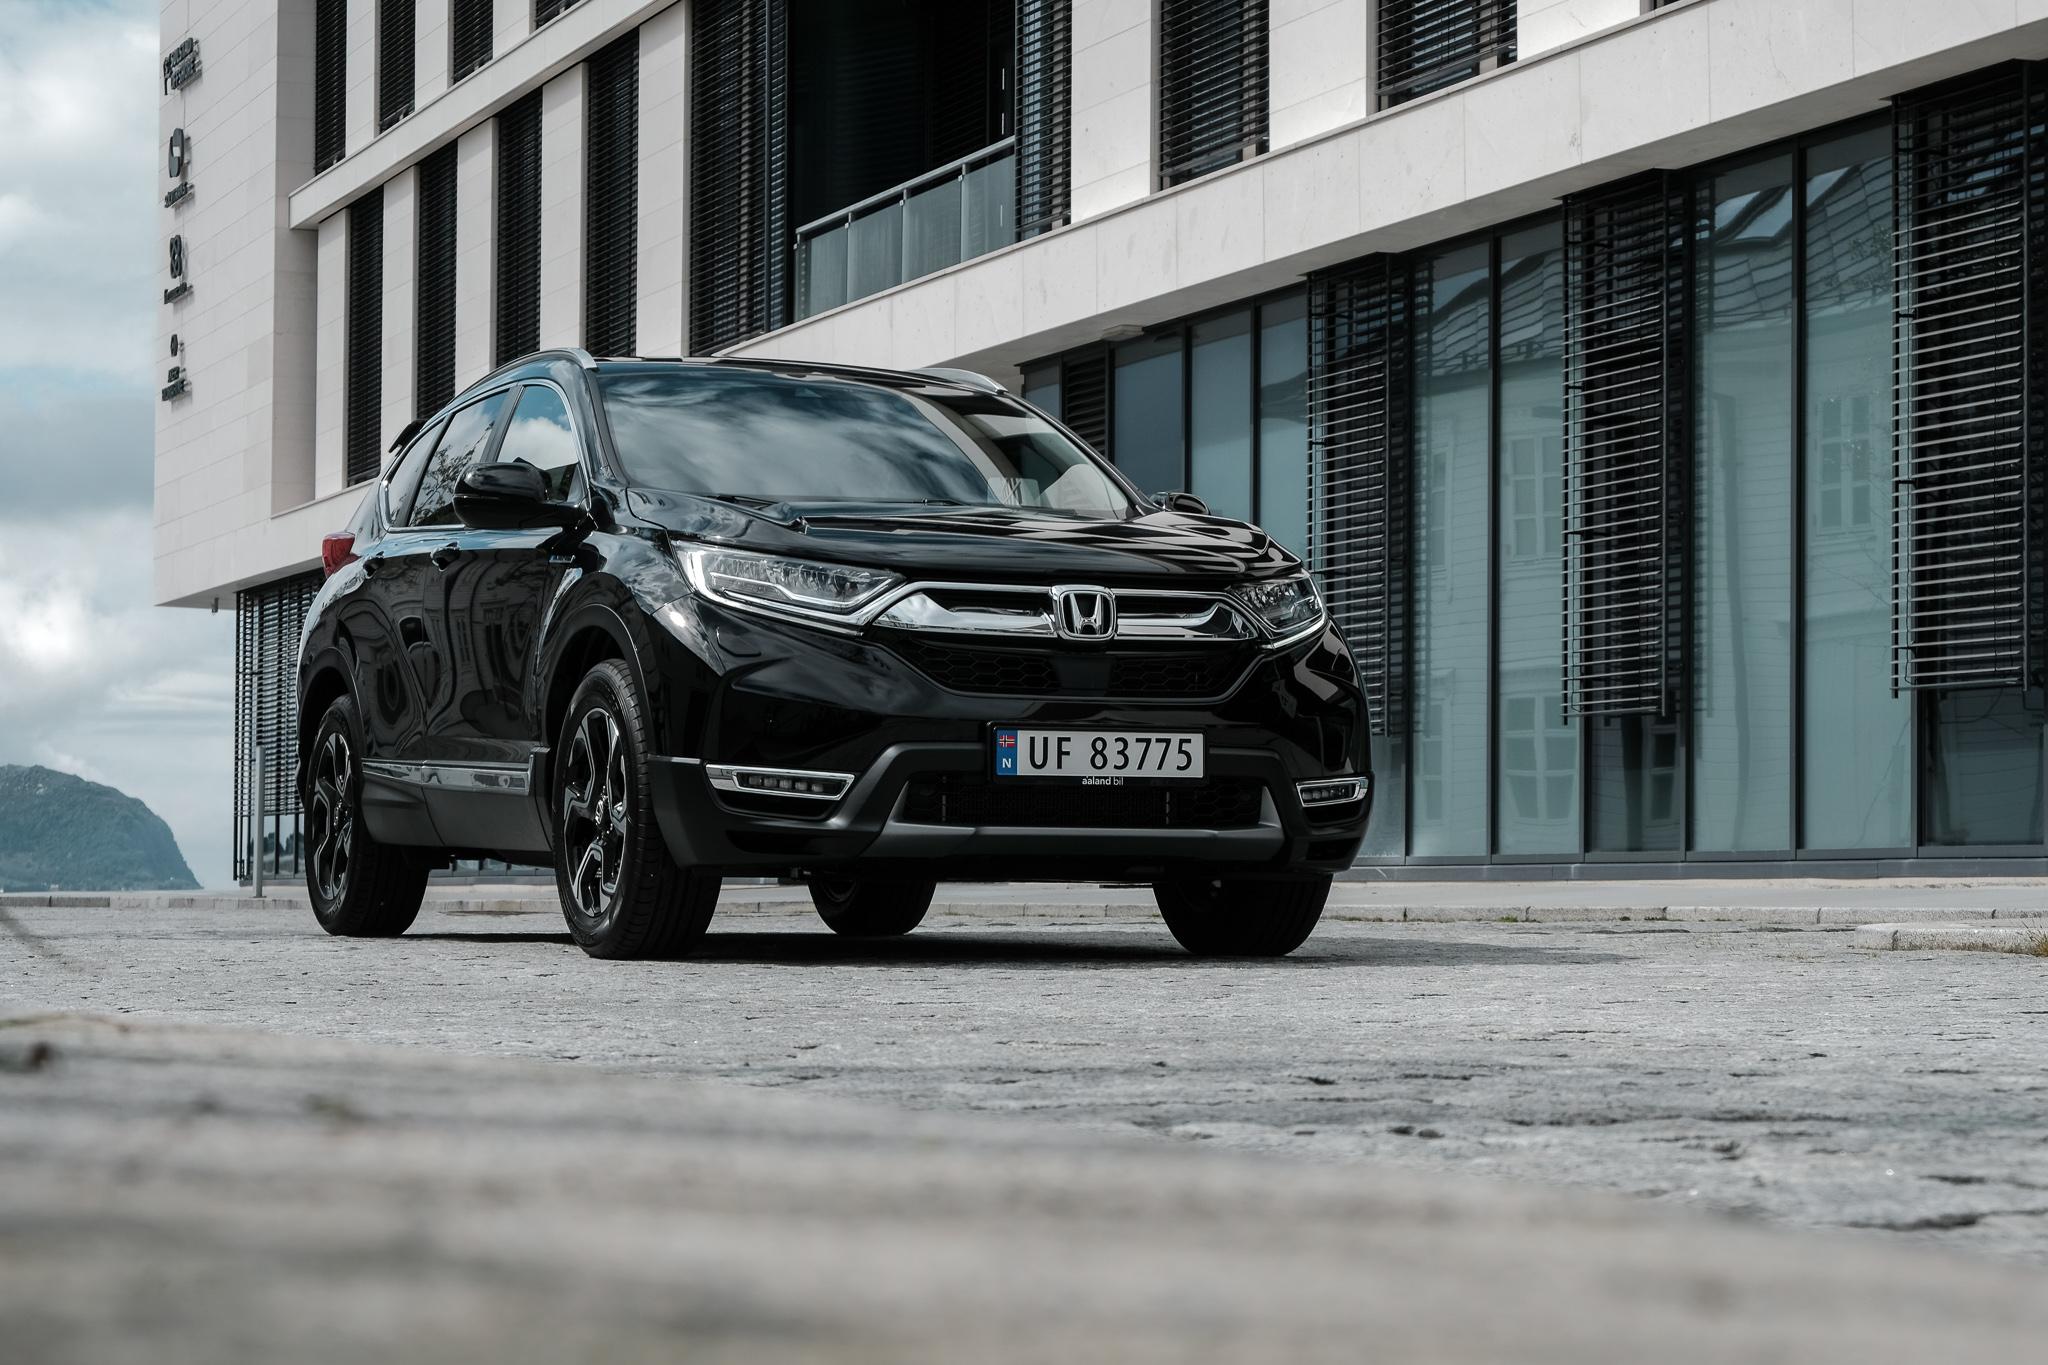 nye-honda-cr-v-hybrid-aaland-bil-alesund-bilforhandler.jpg